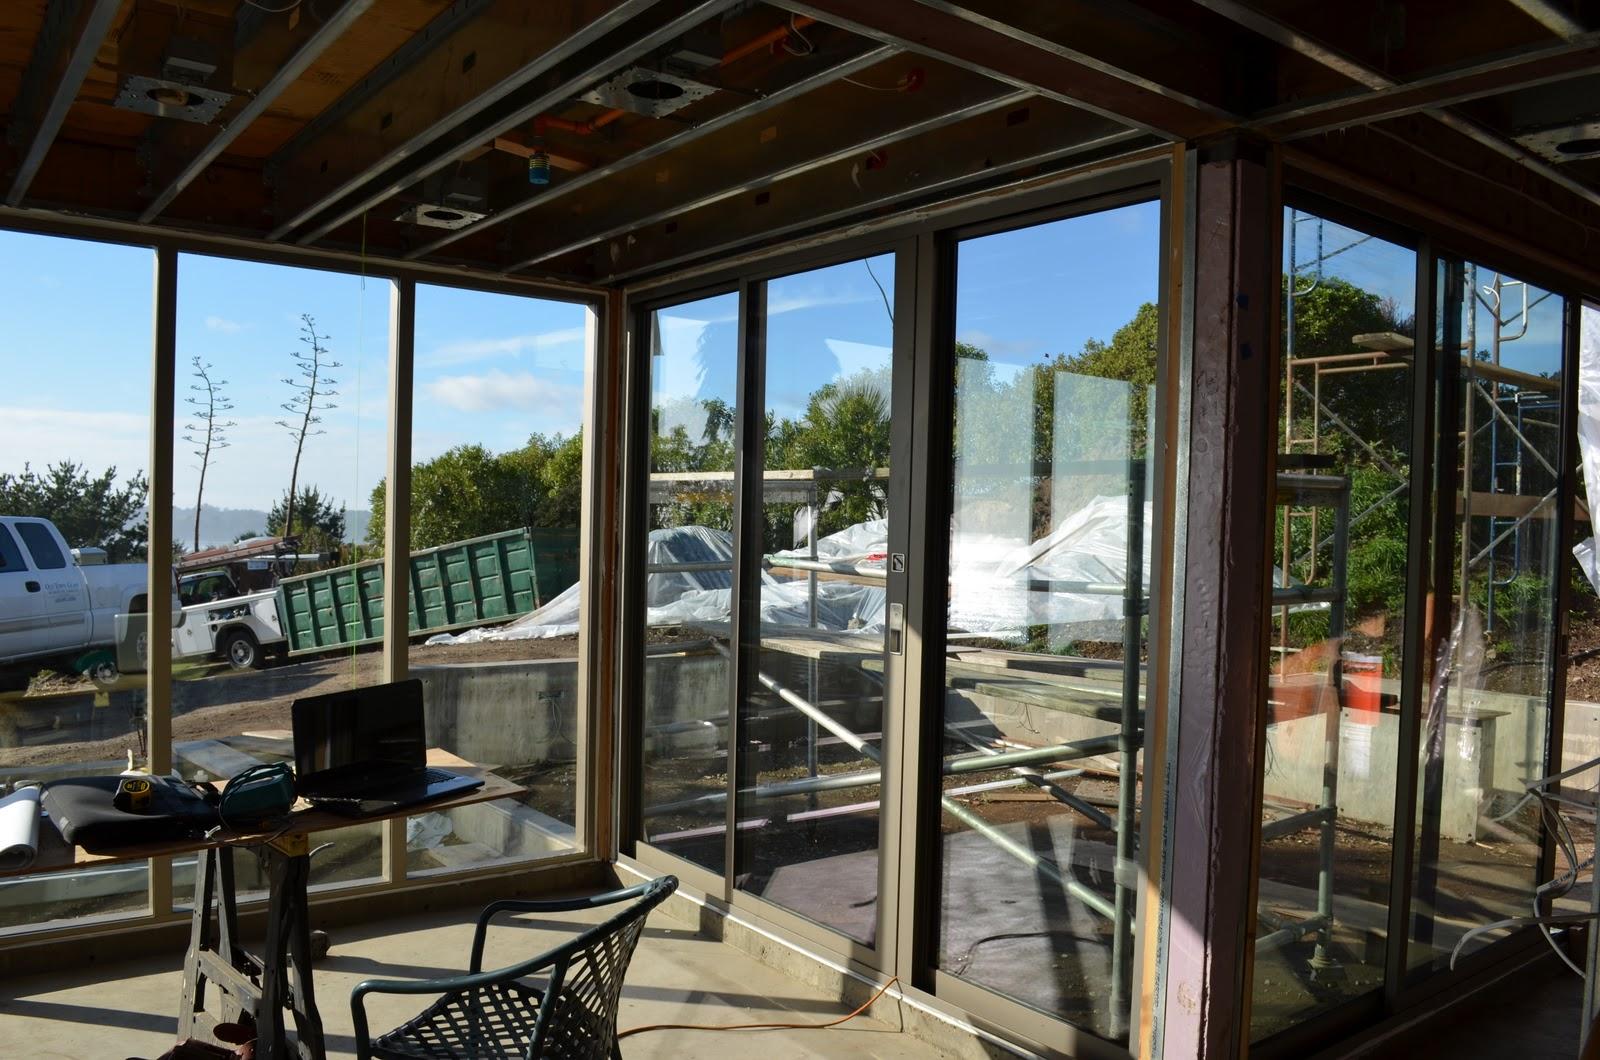 Aluminum Window Fleetwood Aluminum Window. Covered Front Porch. Window World Phoenix. Composite Granite Sink. Modern Siding. Mural Ideas. Ez Screen. Slate Tile Shower. In Wall Medicine Cabinet